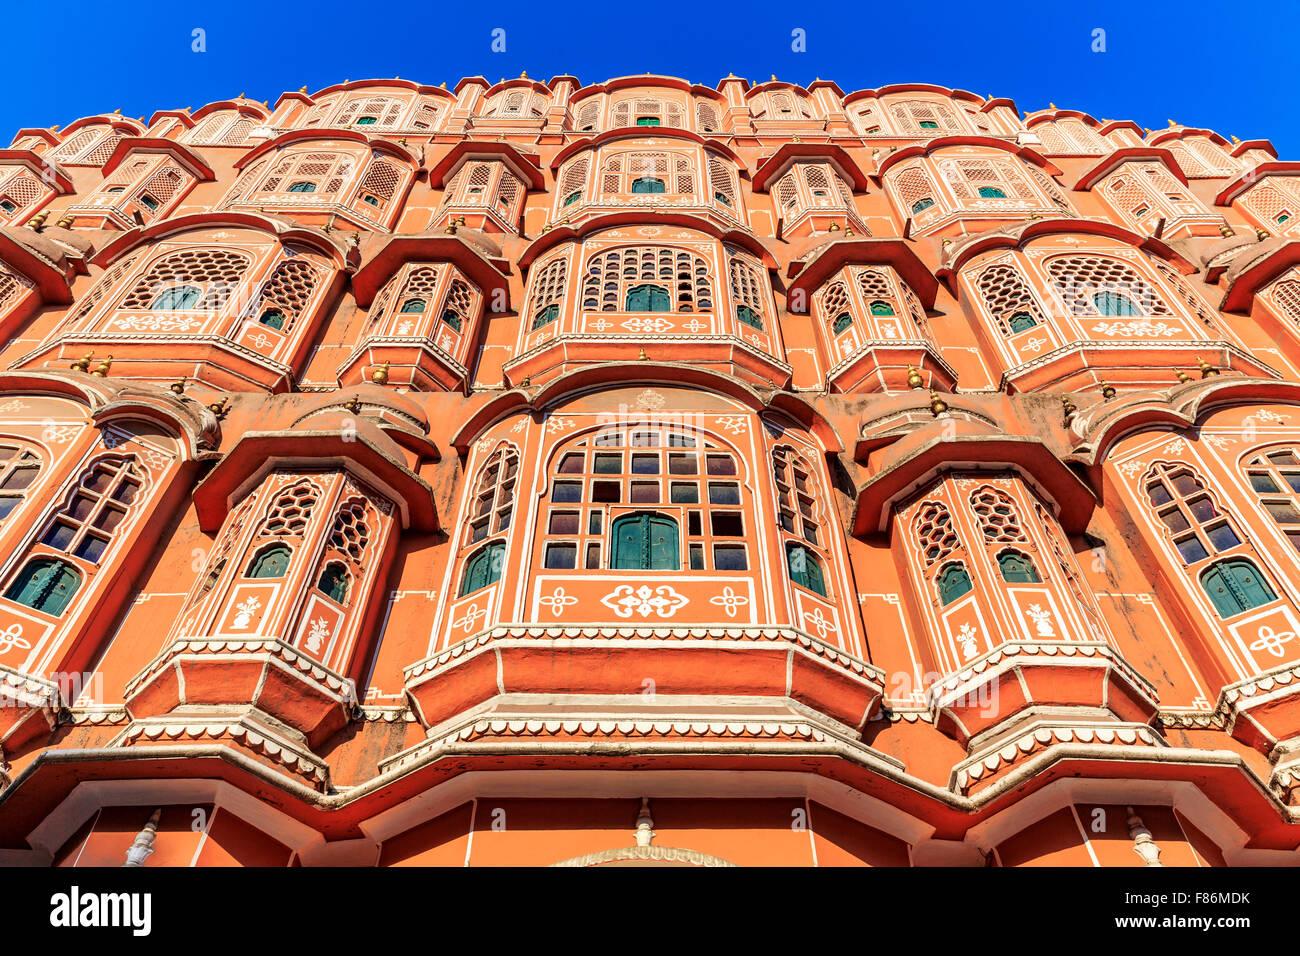 Façade de l'Hawa Mahal, le palais des vents, Jaipur, Rajasthan, Inde Photo Stock